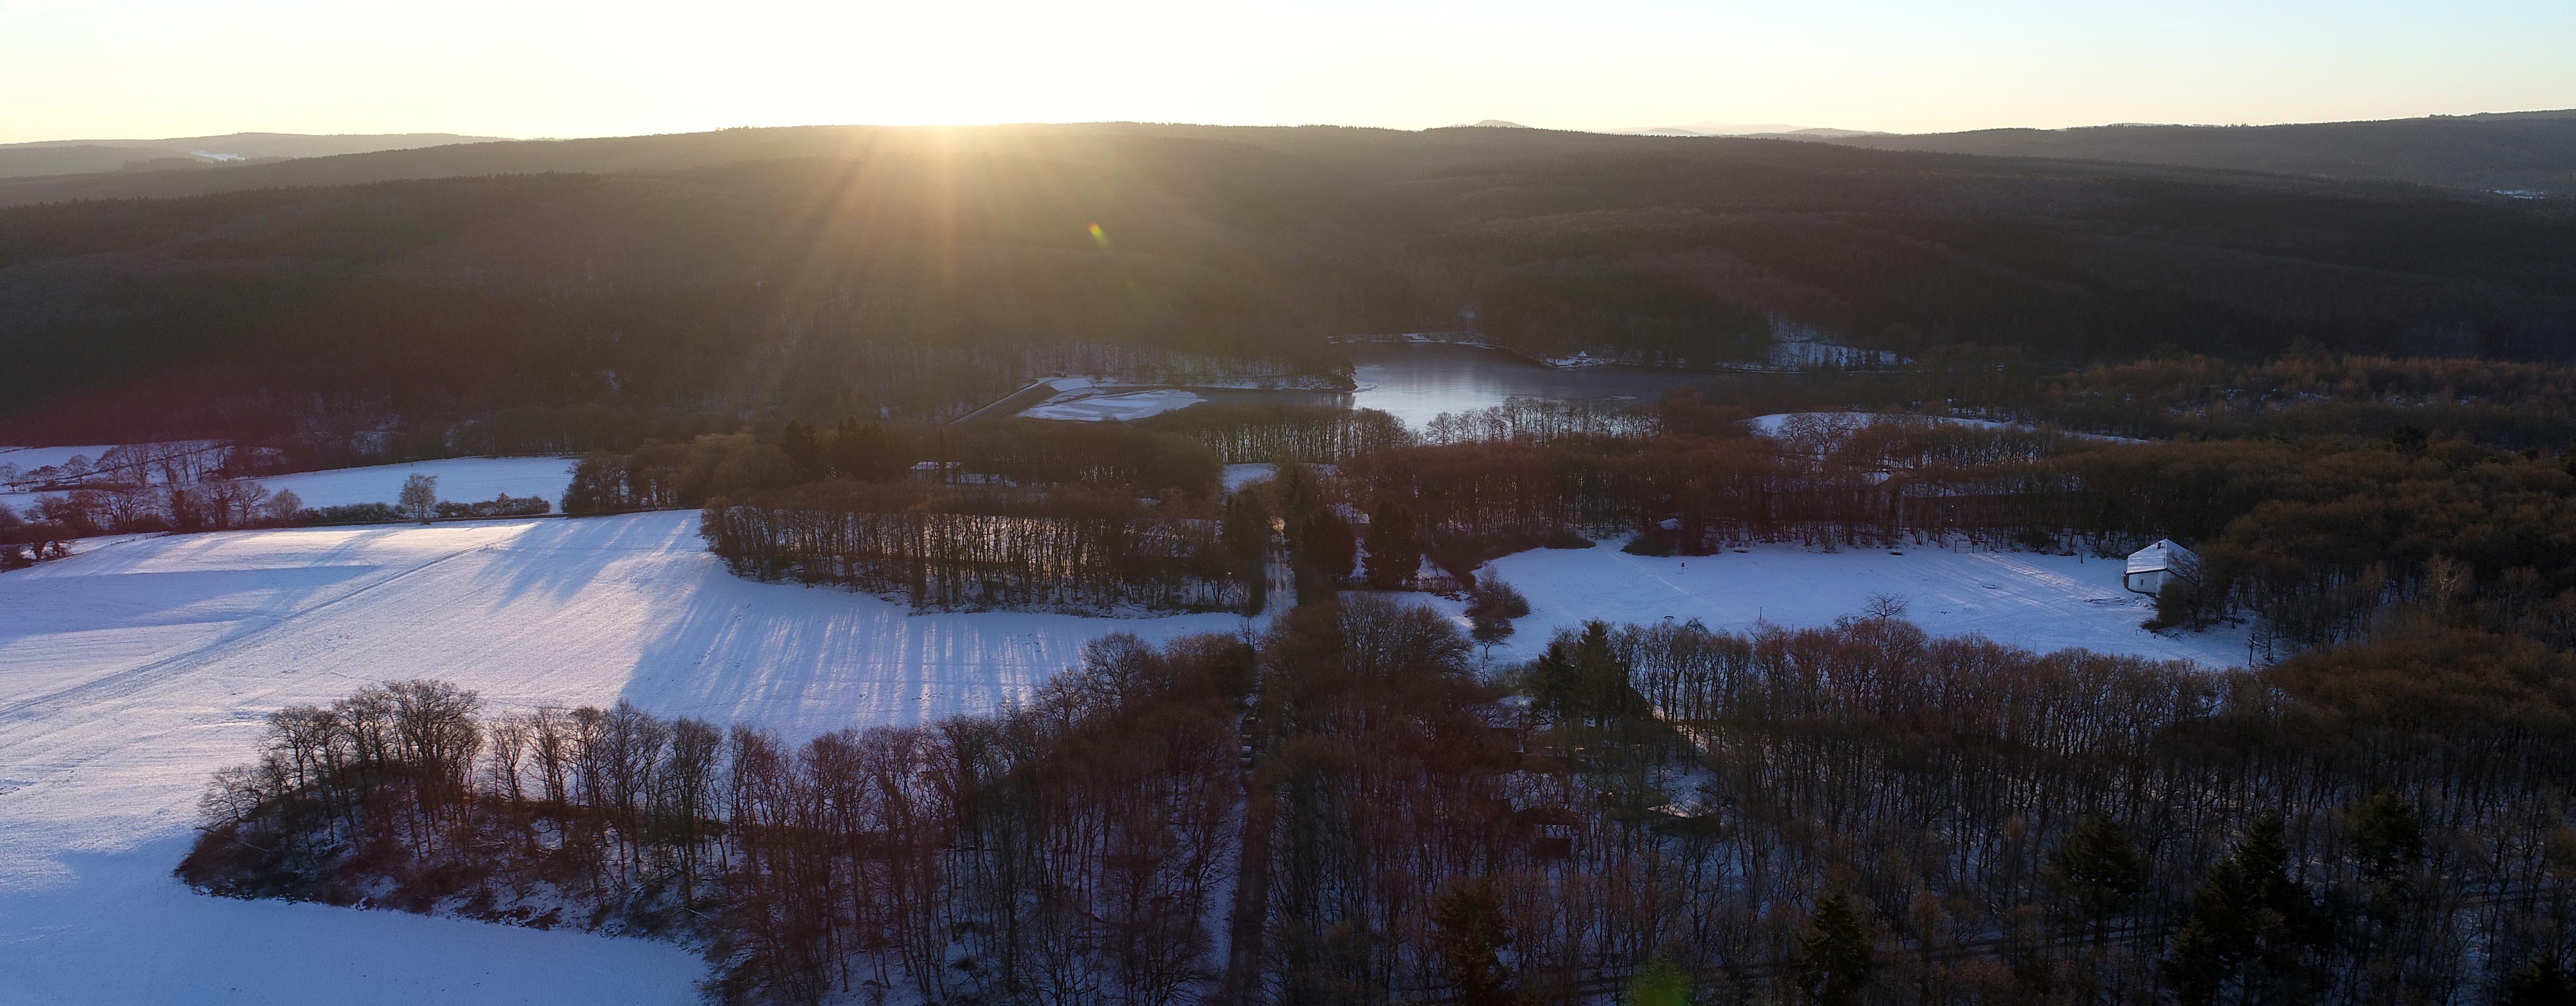 Luftfotos Eifel